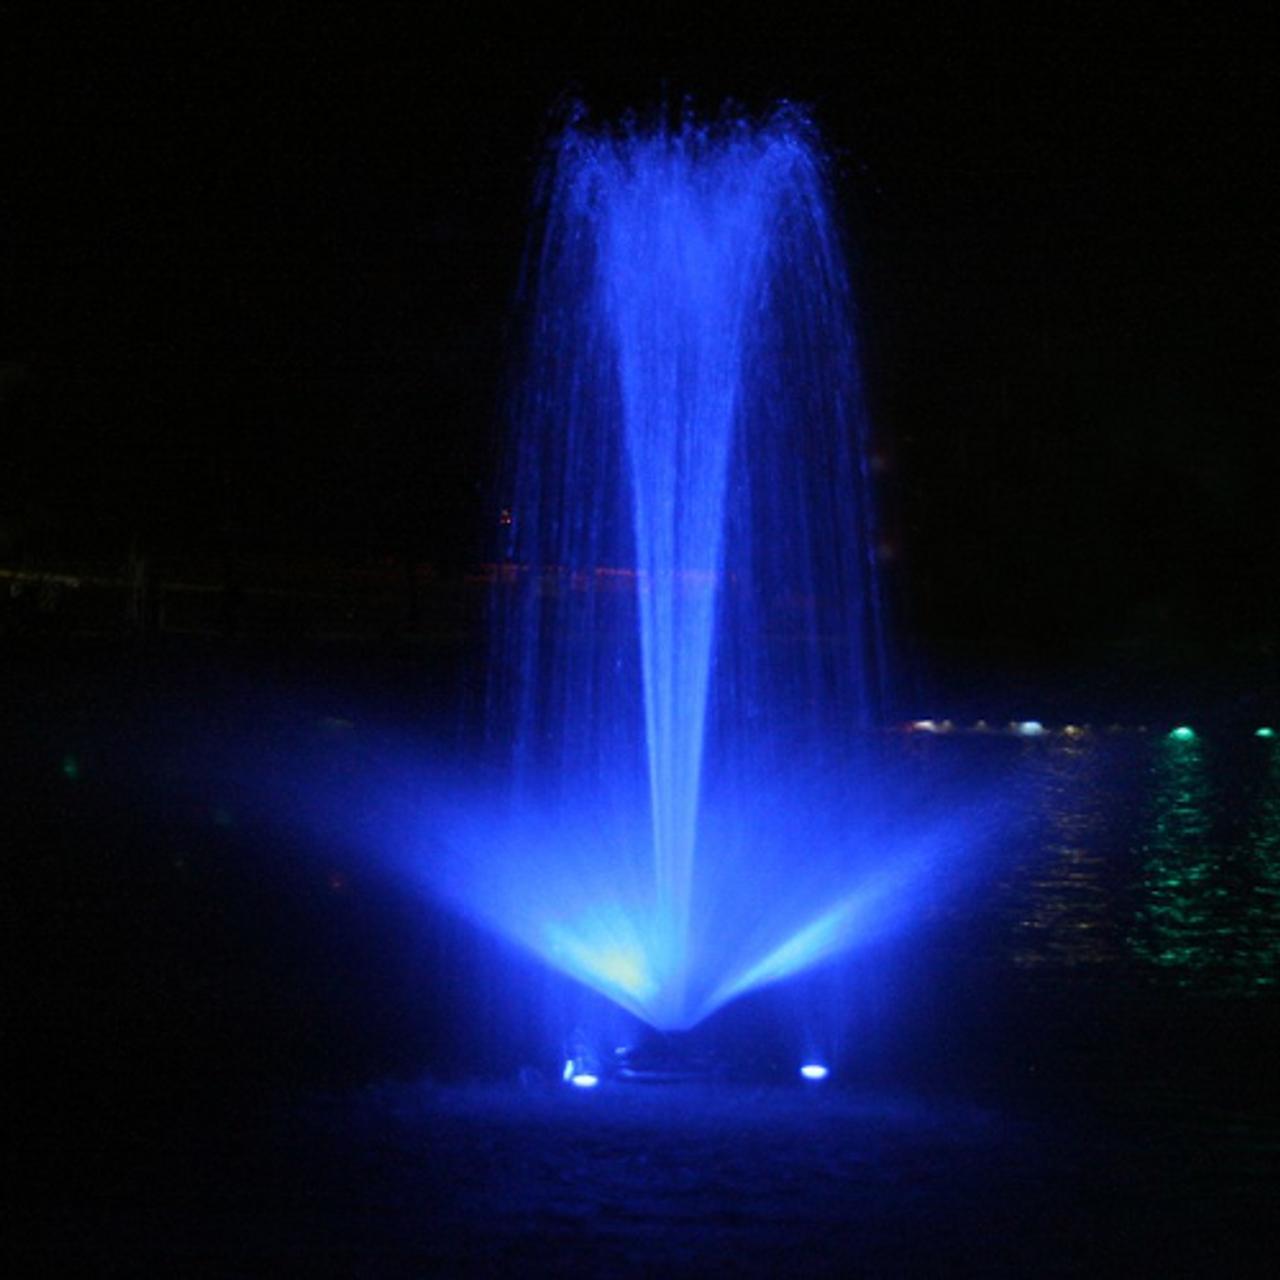 Kasco RGB LED 6 light set for Kasco water fountains